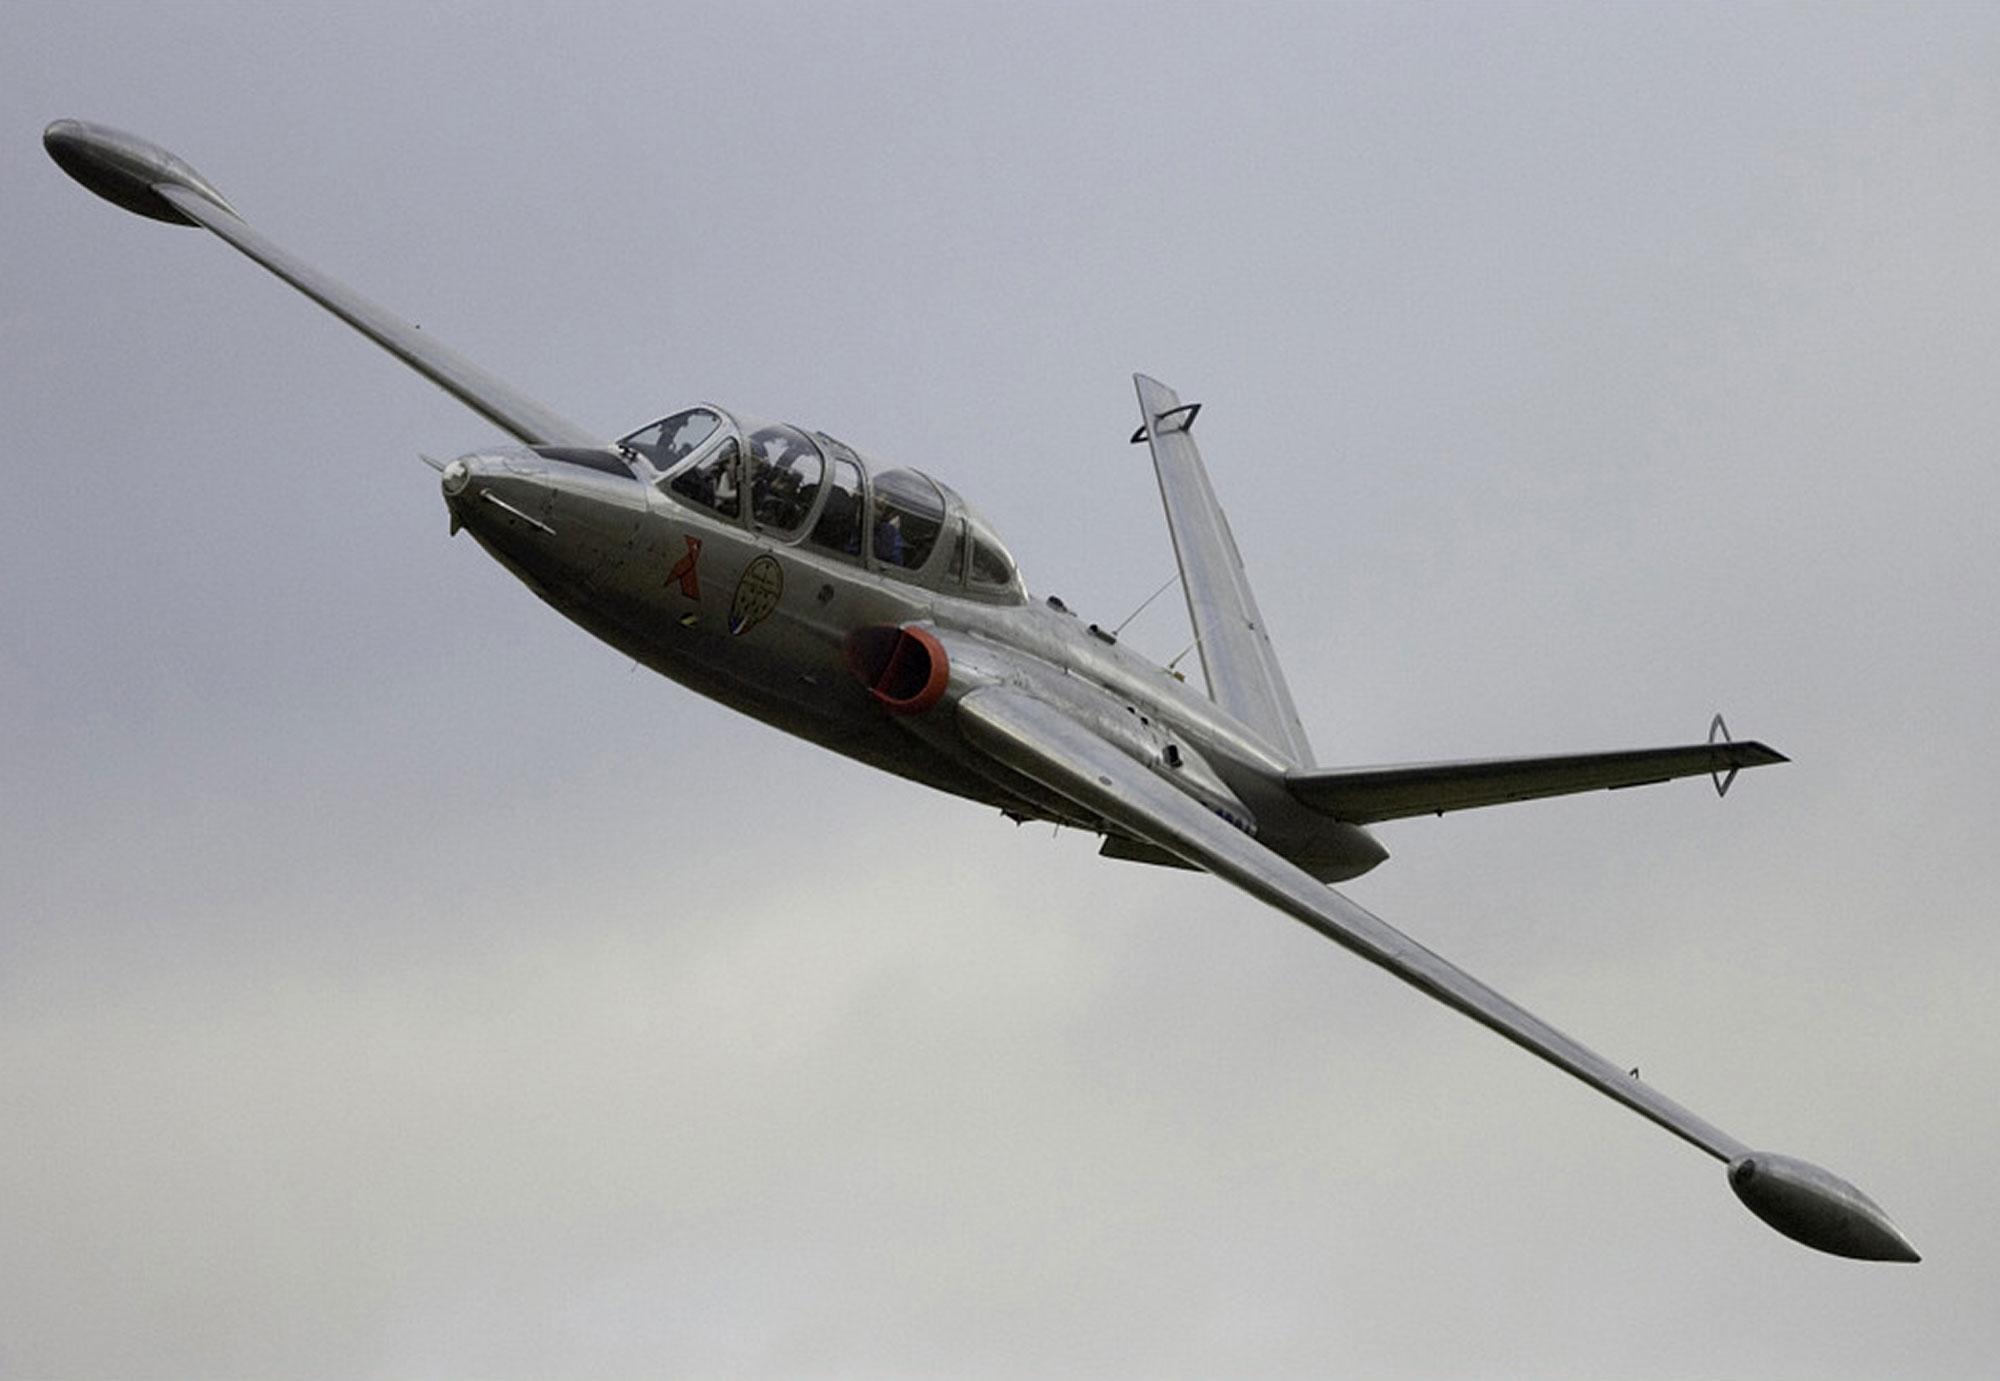 vol avion chasse fouga magister